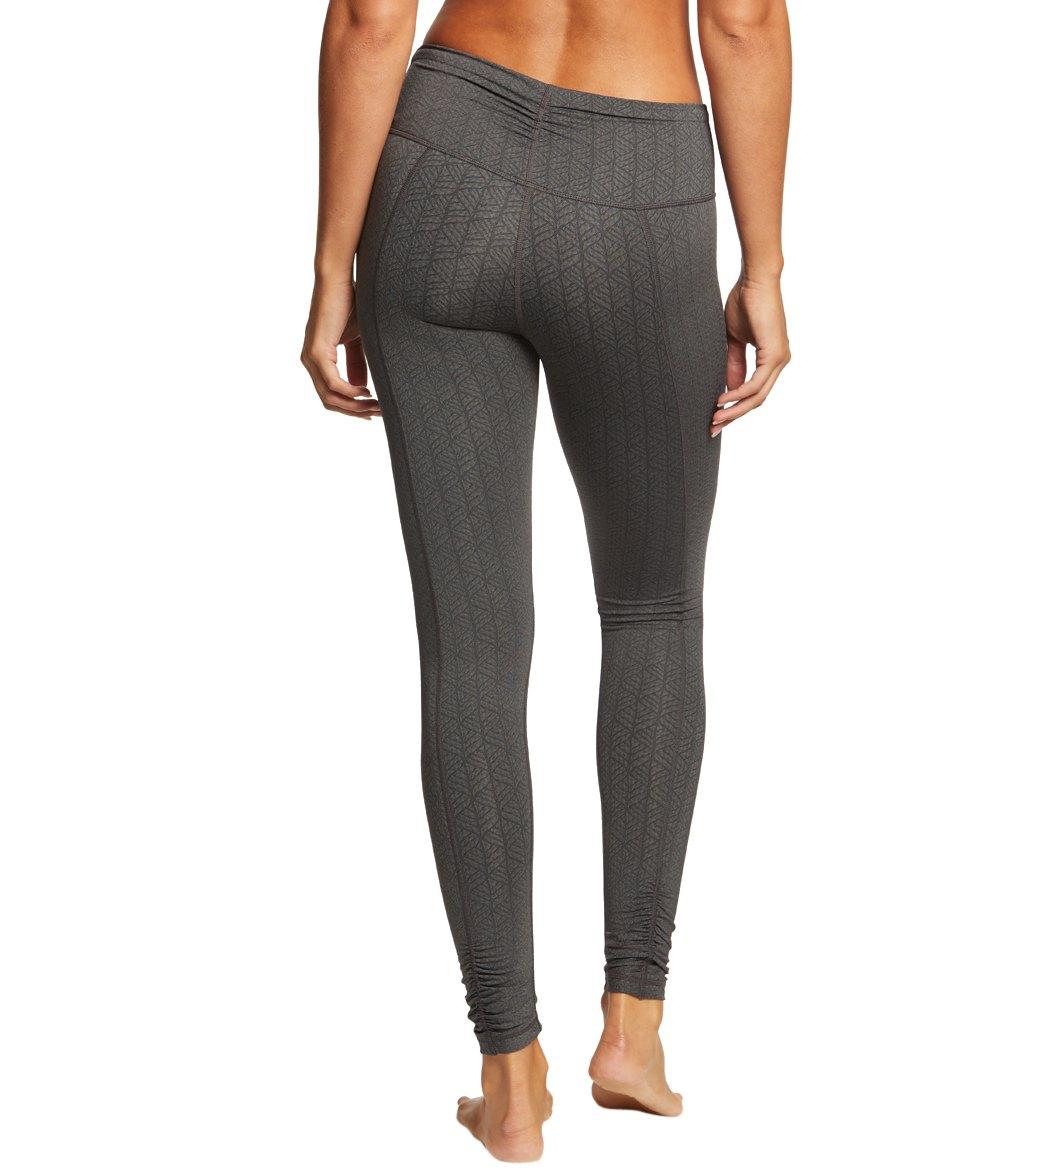 43eedfafe1 Prana Misty Yoga Leggings at YogaOutlet.com - Free Shipping